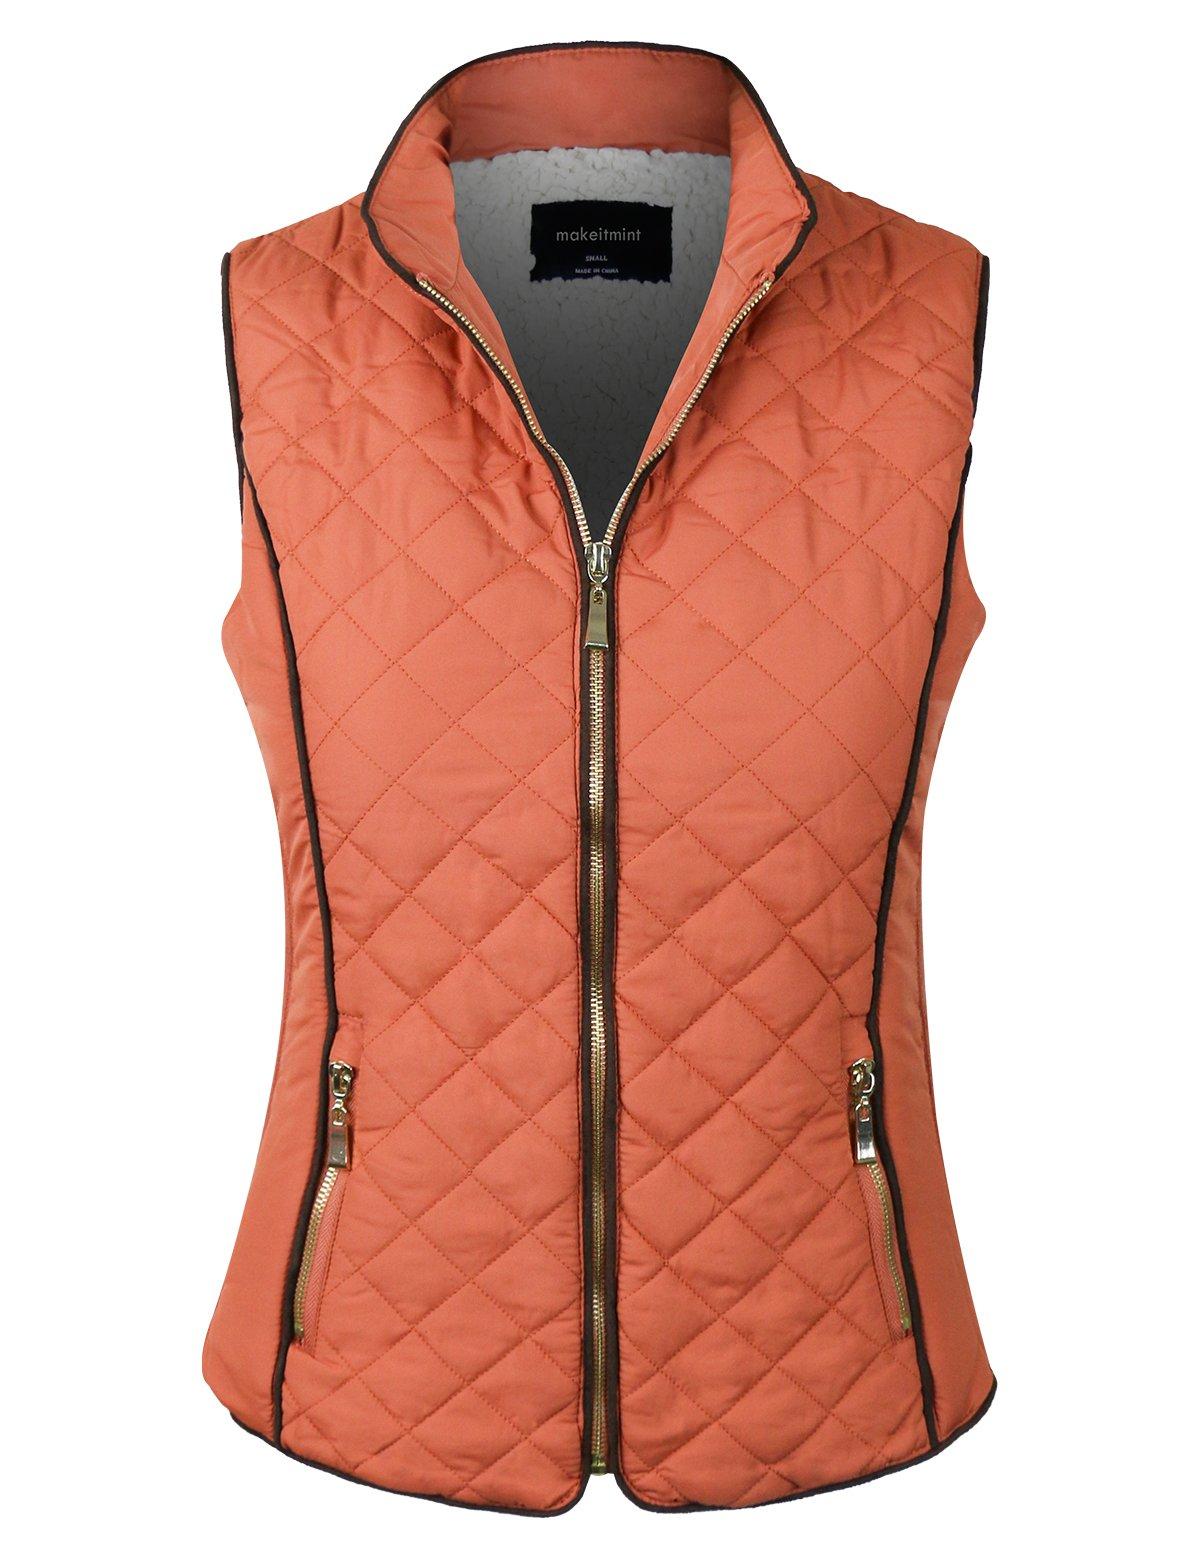 makeitmint Women's Quilted Soft Shearling Lining Padding Pocket Vest [S-3XL] YJV0002-24RUST-LRG